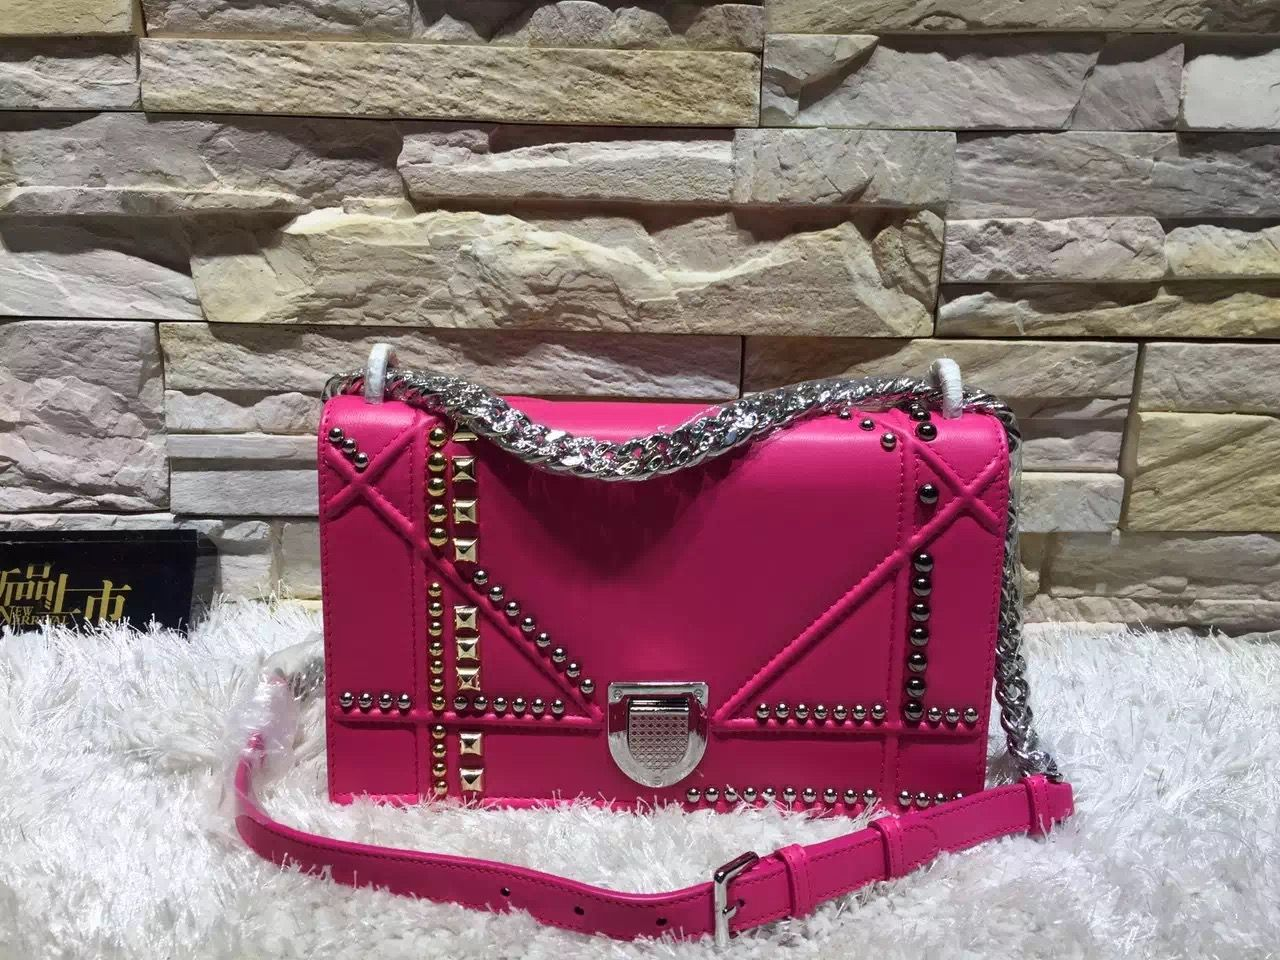 f8c3c5426d Dior Diorama Bag 100% Authentic 80% Off | Dior Bag Sale in 2019 ...